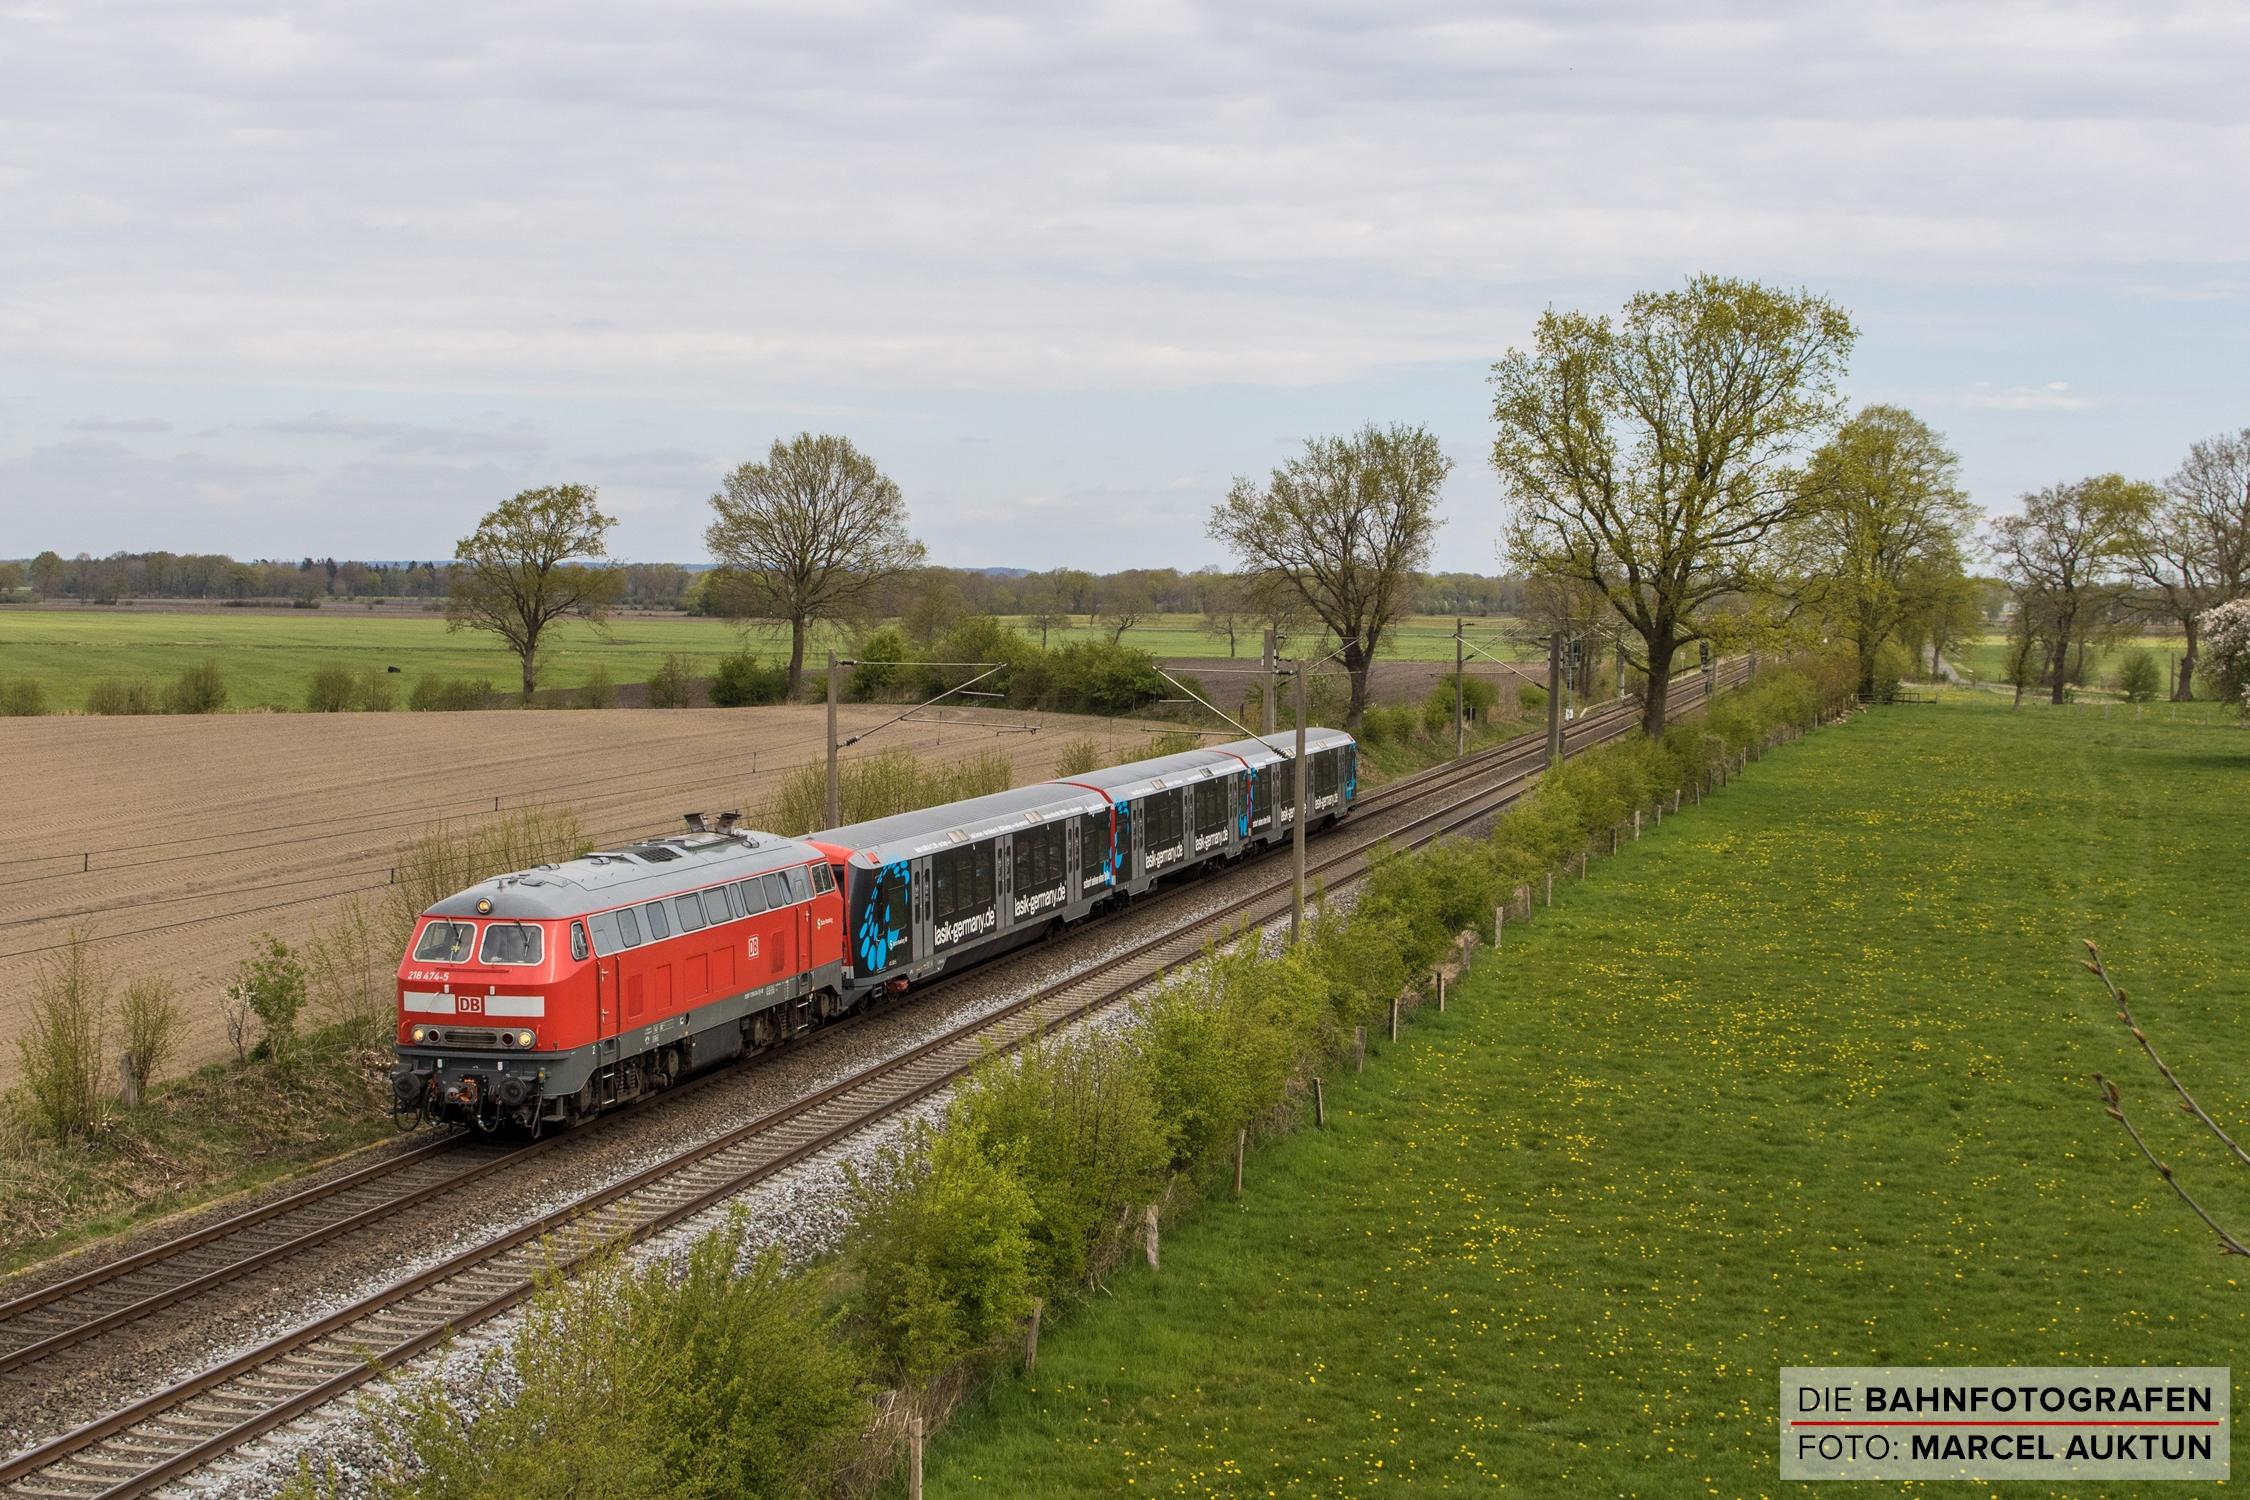 https://diebahnfotografen.de/wp-content/uploads/2020/05/218-474-474-005-Osterhorn.jpg